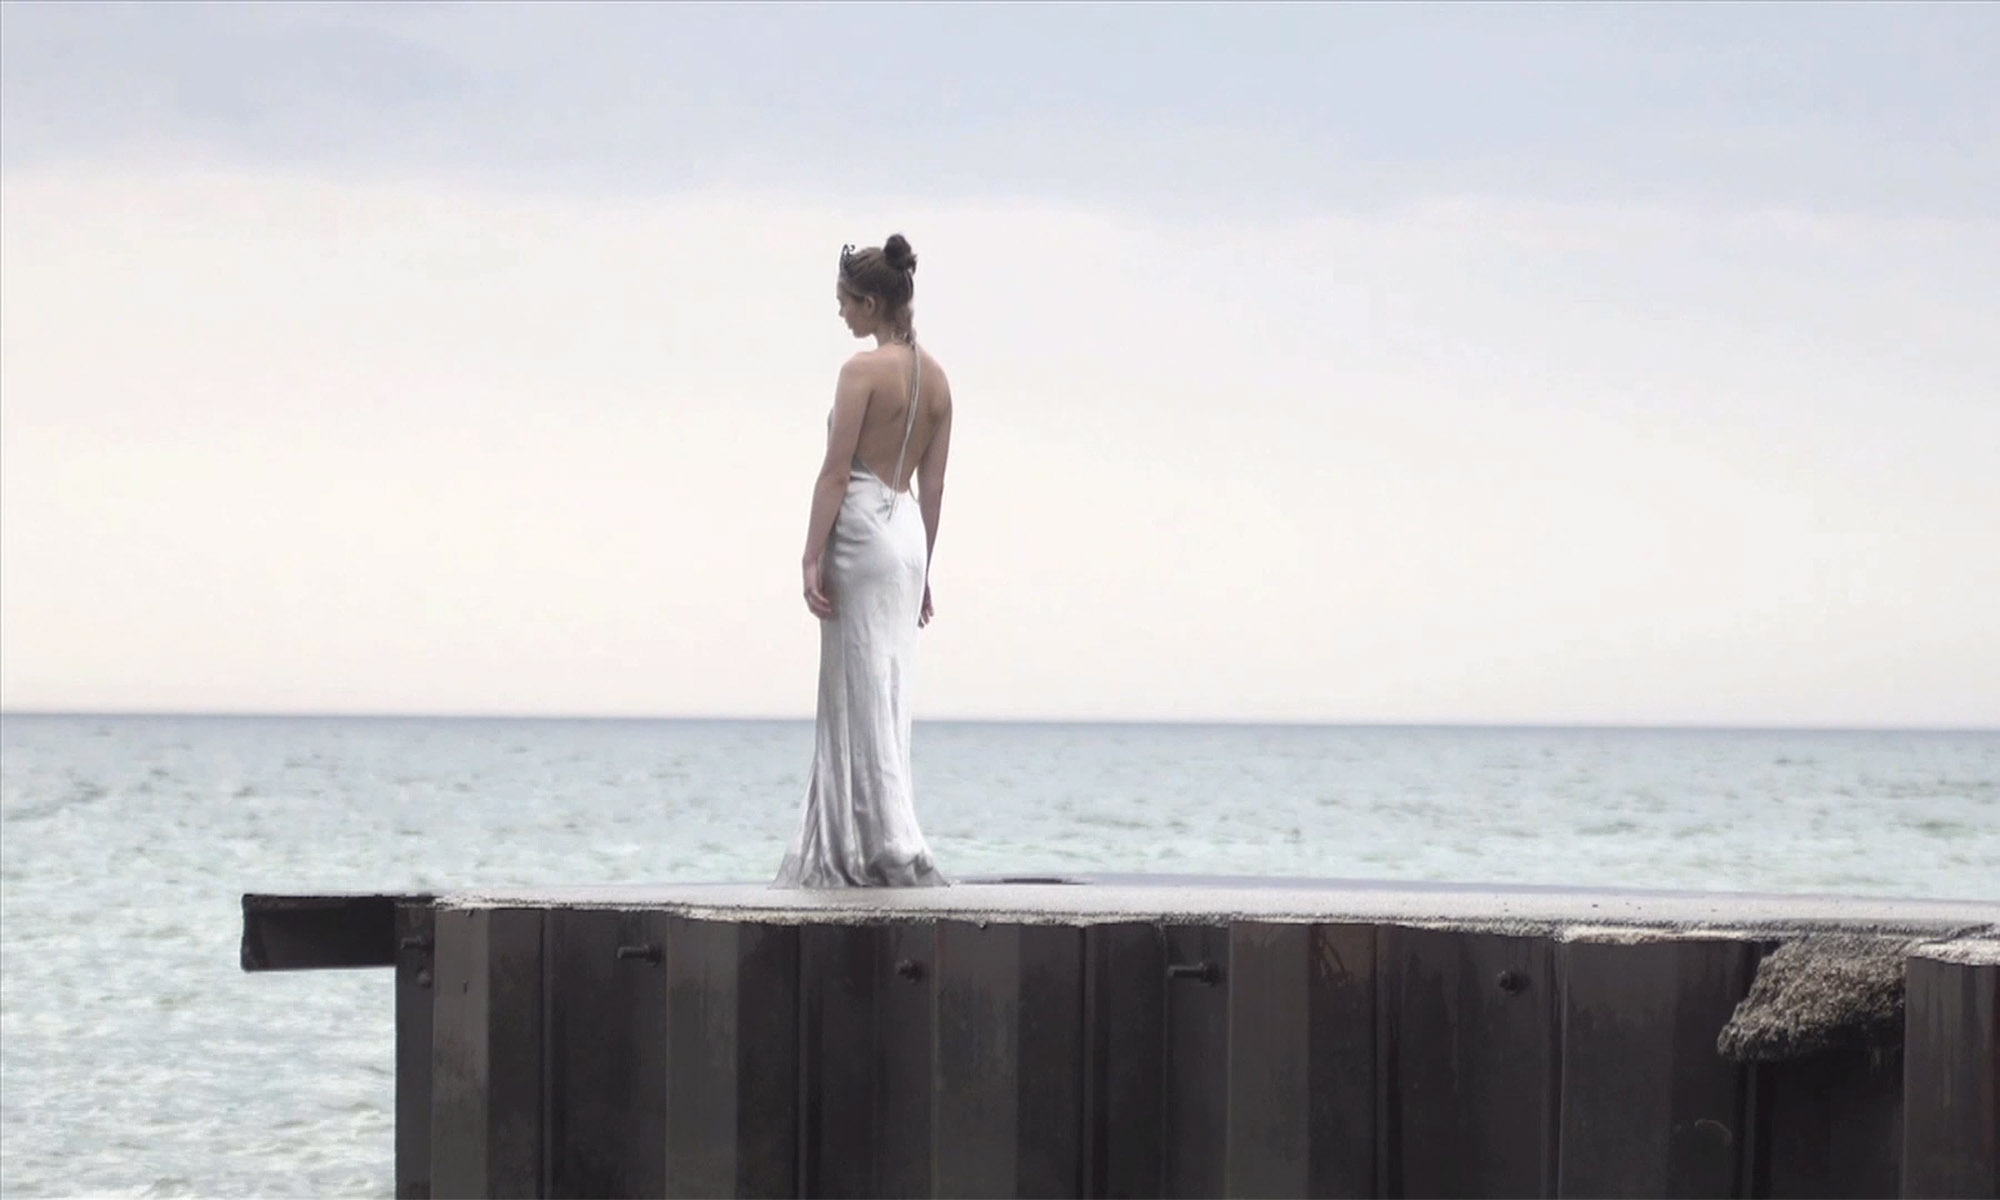 Music Video Kate Sublett Production Film Toronto Big City 2